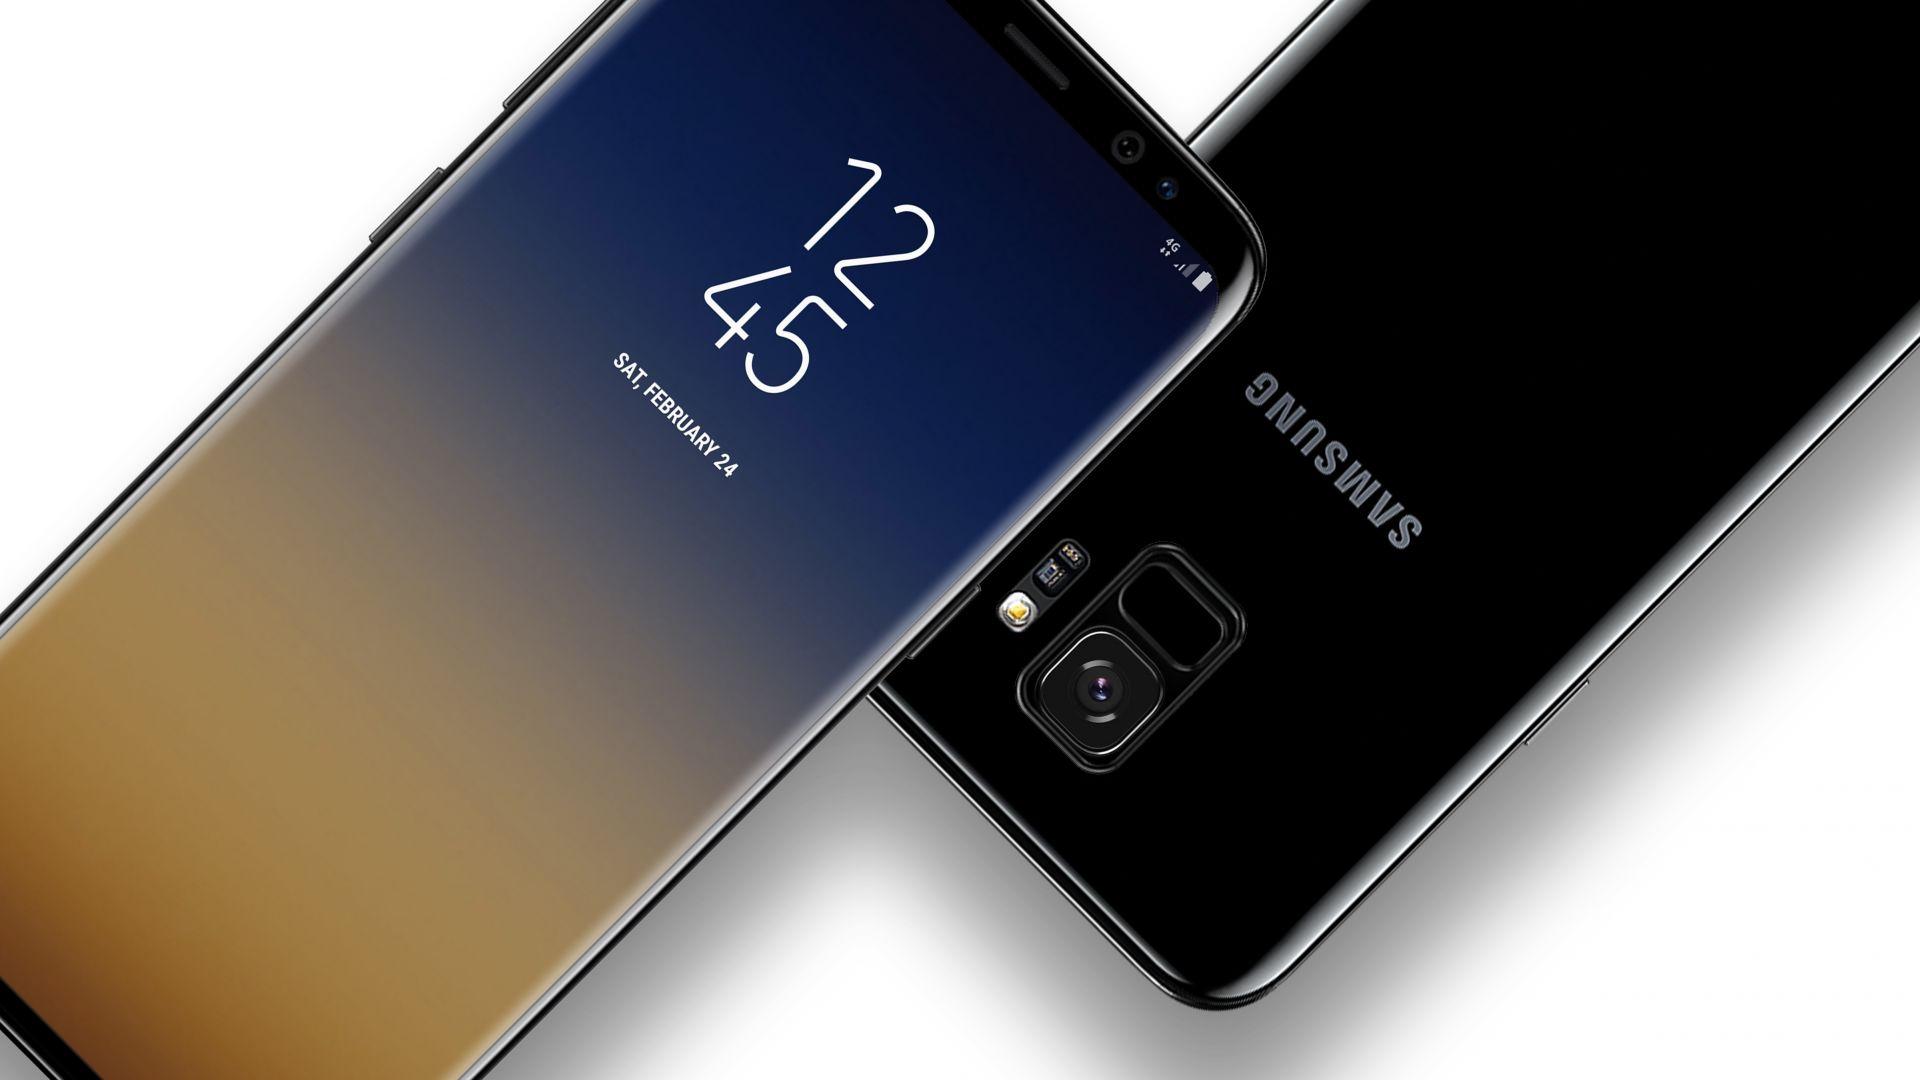 4k Samsung S9